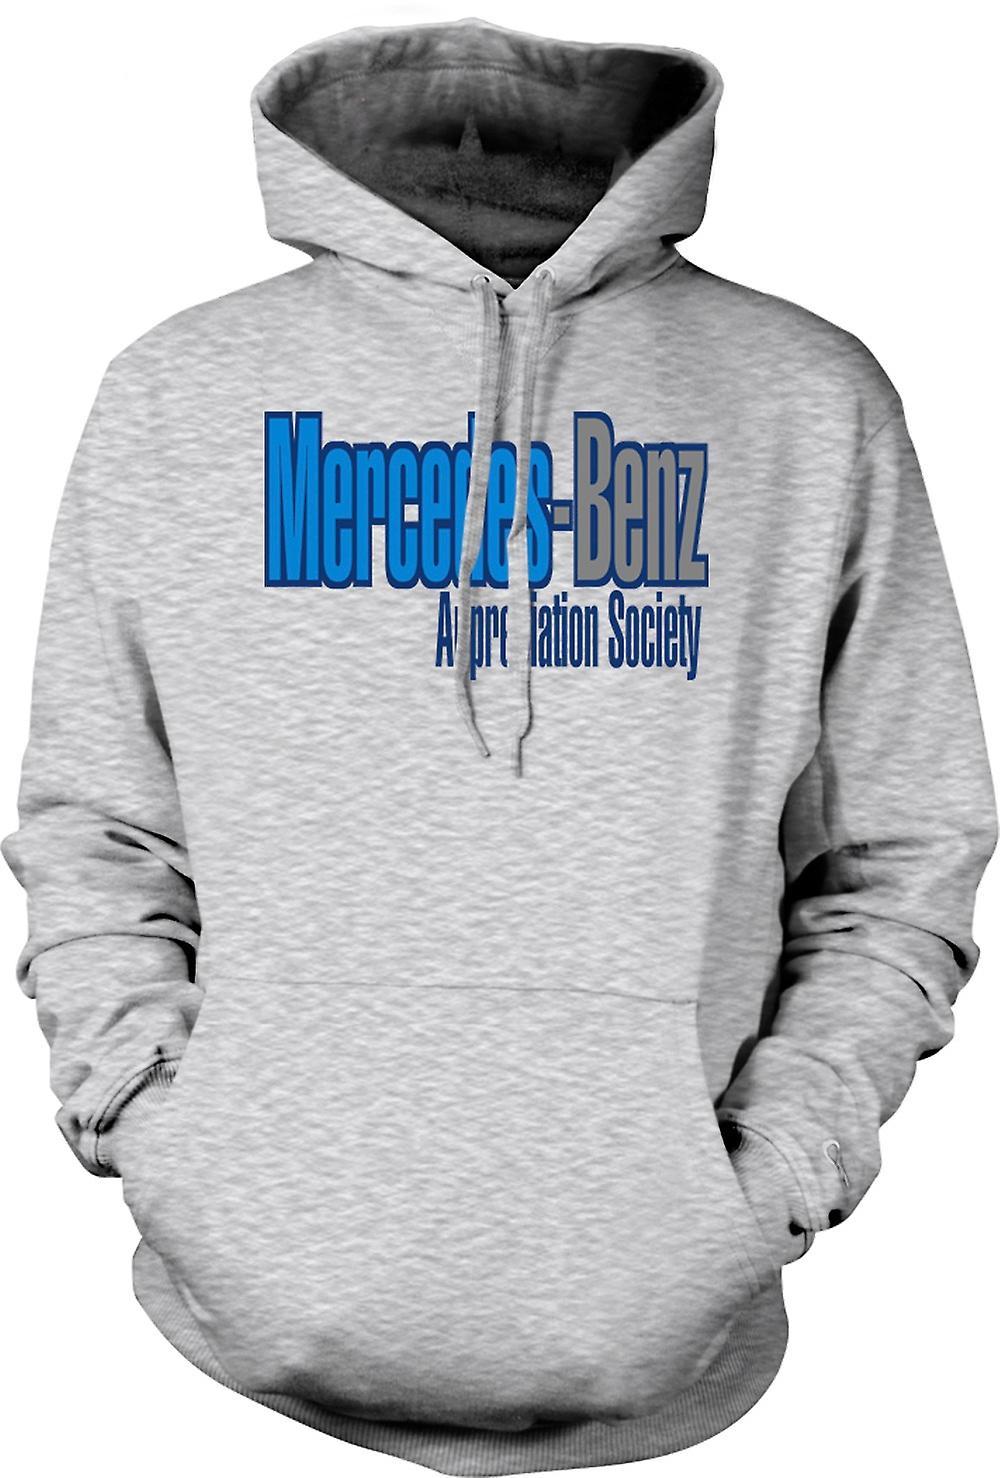 mens hoodie mercedes benz appreciation society fruugo. Black Bedroom Furniture Sets. Home Design Ideas